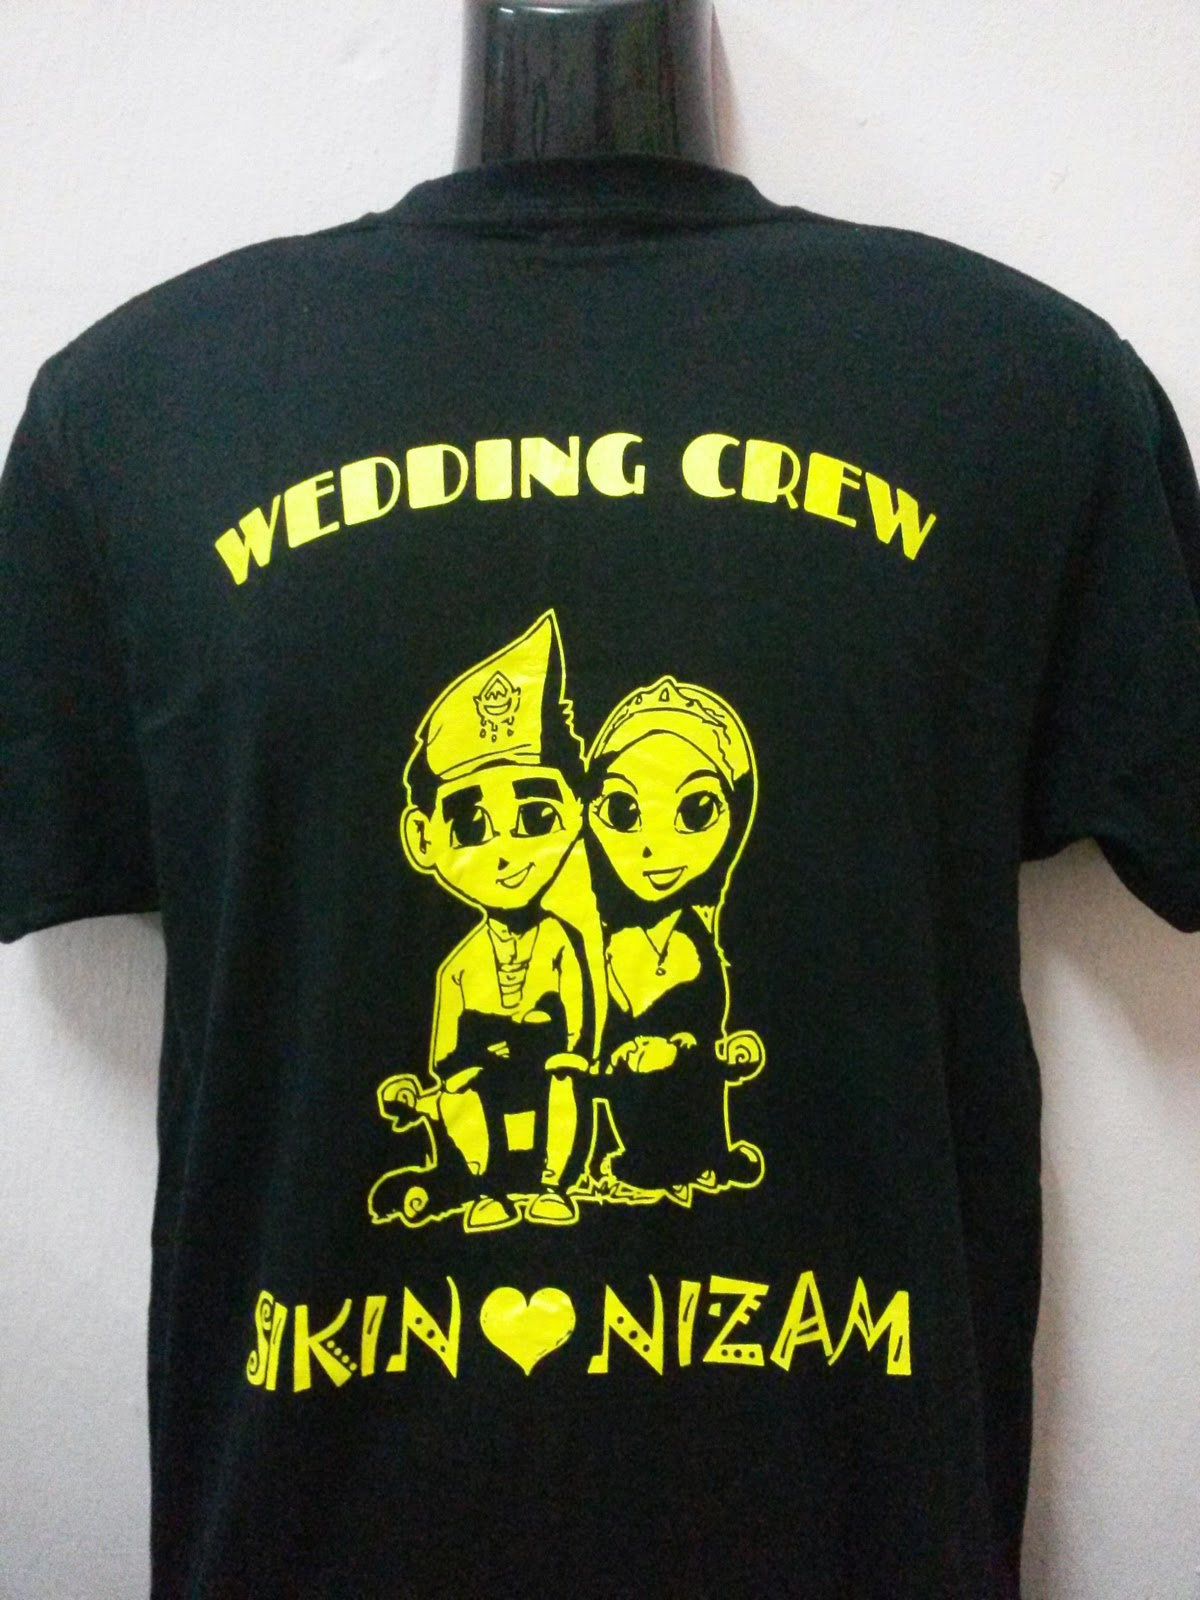 Design t shirt rewang - Tempahan Tshirt Wedsing Crew Qty 30helai Your Design We Do Jom Tempah Tshirt Printing Penghantaran Disediakan Ke Seluruh Malaysia Dengan Harga Yang Murah